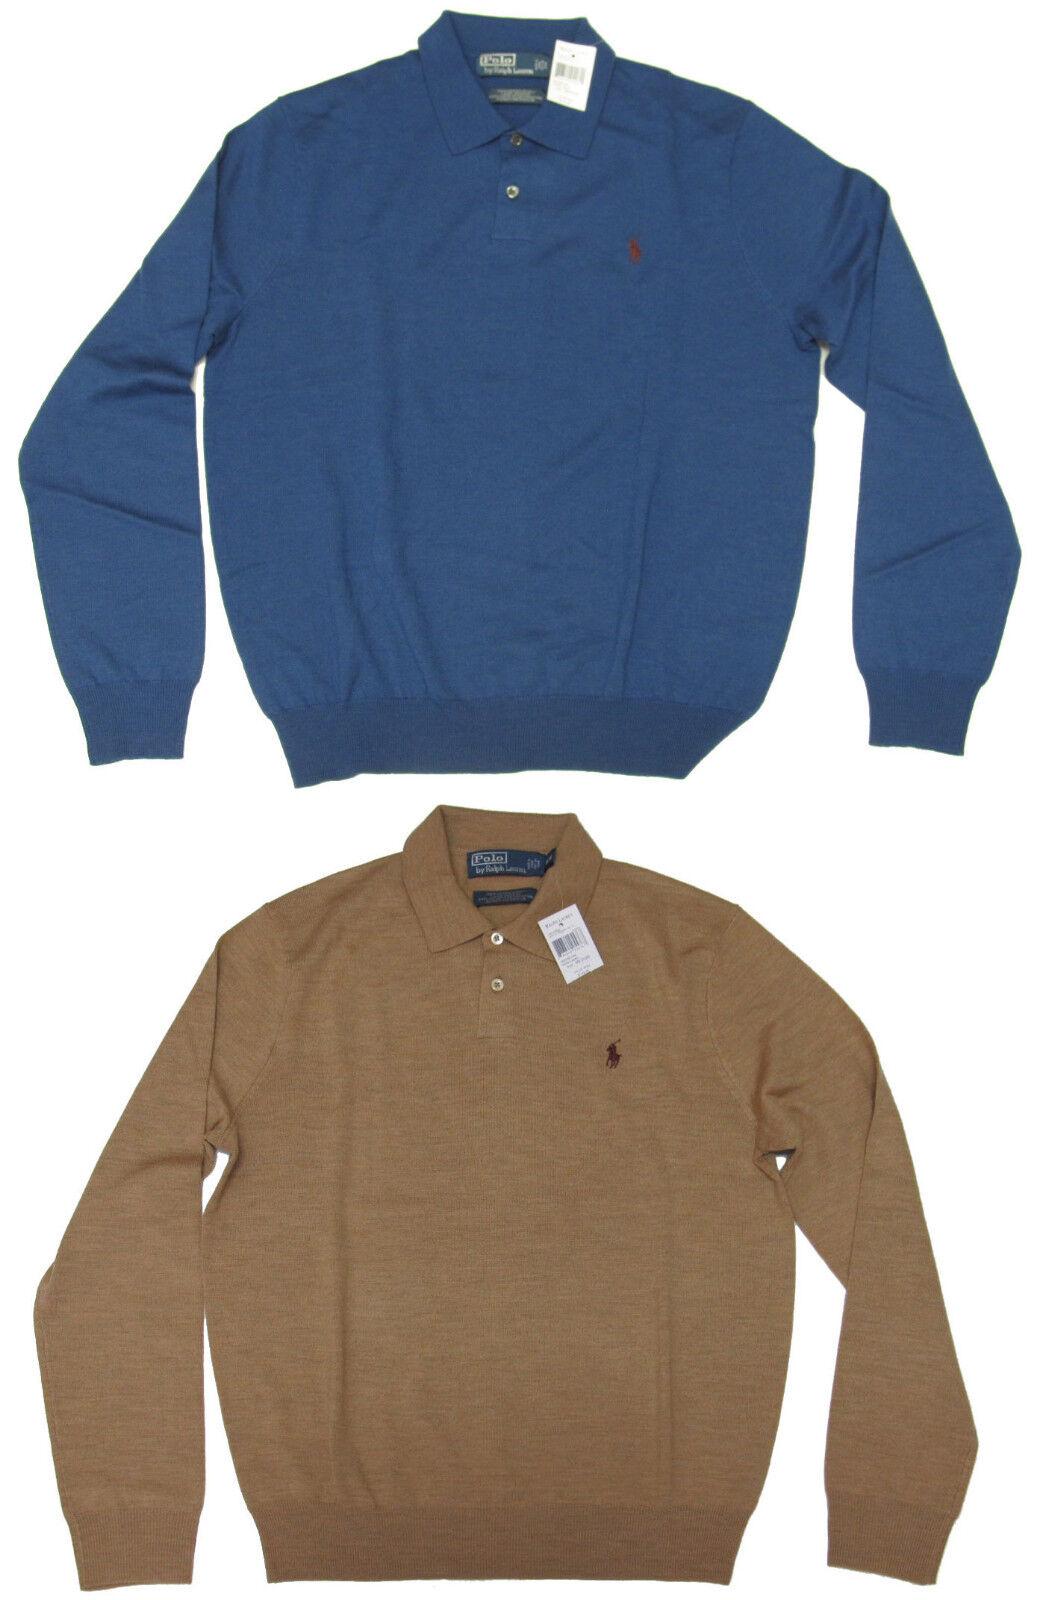 Ralph Lauren Mens Wool Knit bluee Brown Pony Logo LS Shirt Polo Sweater New